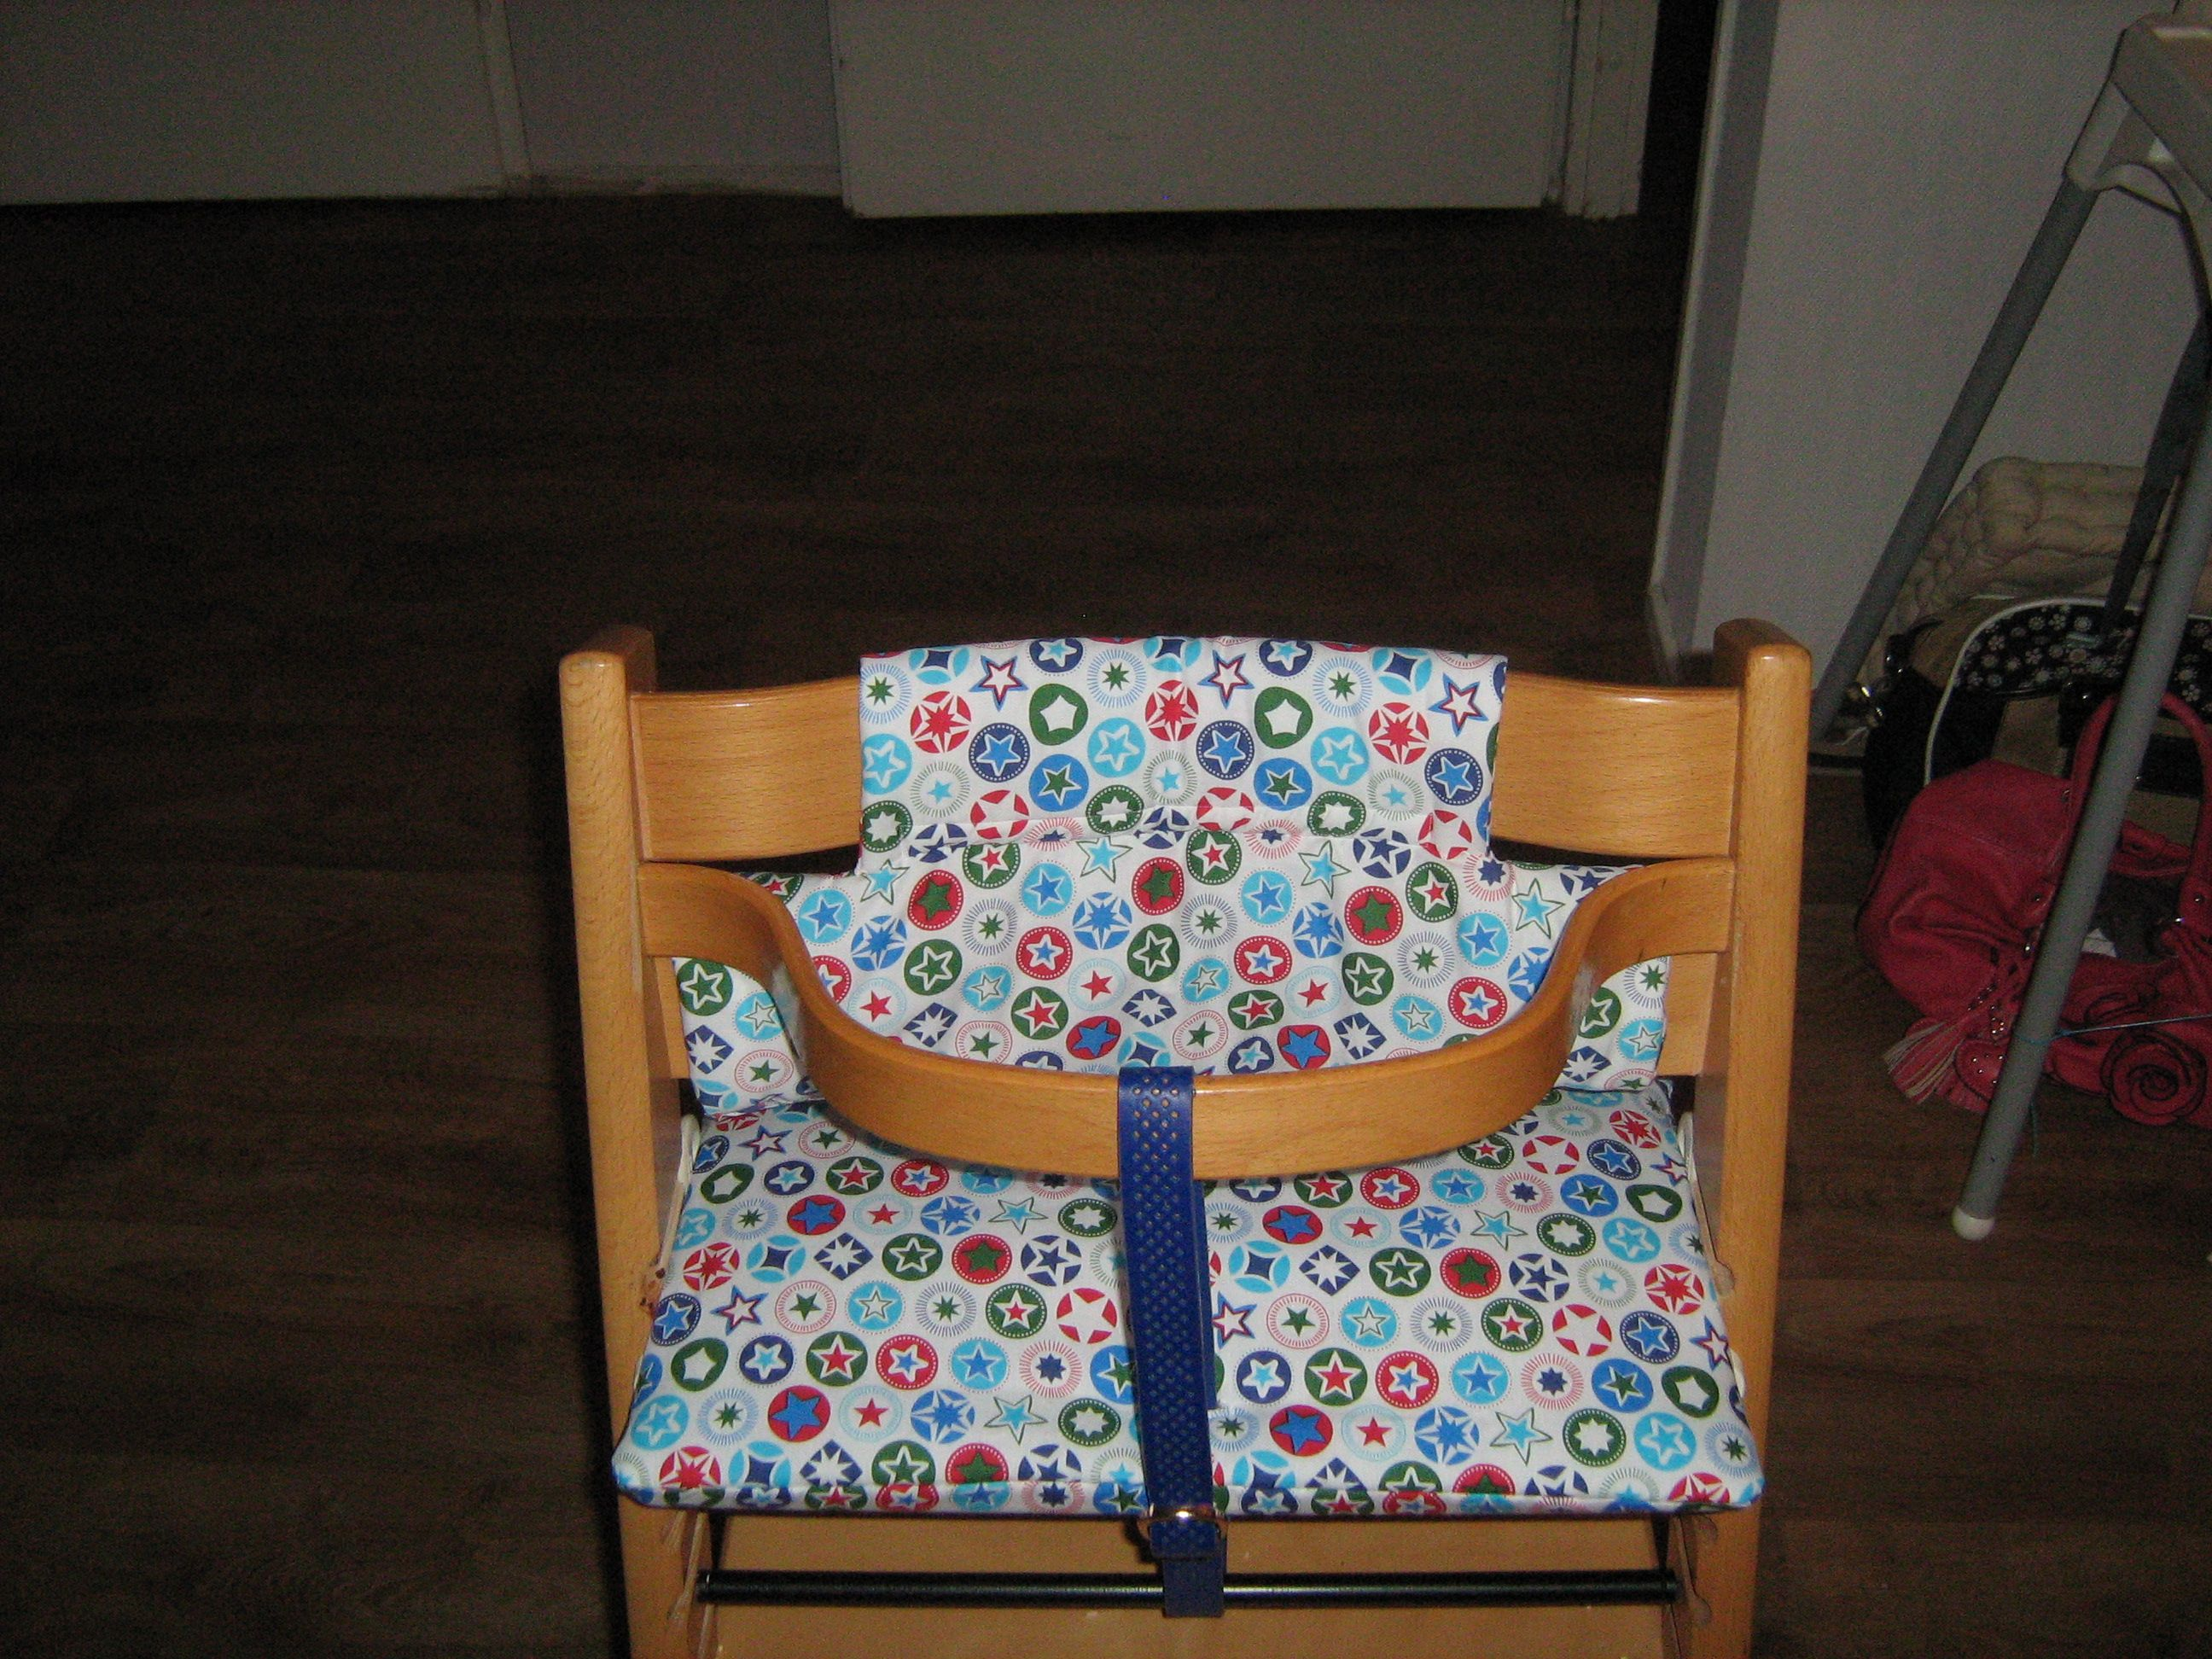 Stokke Tripp Trapp high chair cushions, made by me. Kinderstoel kussens zelfgemaakt.